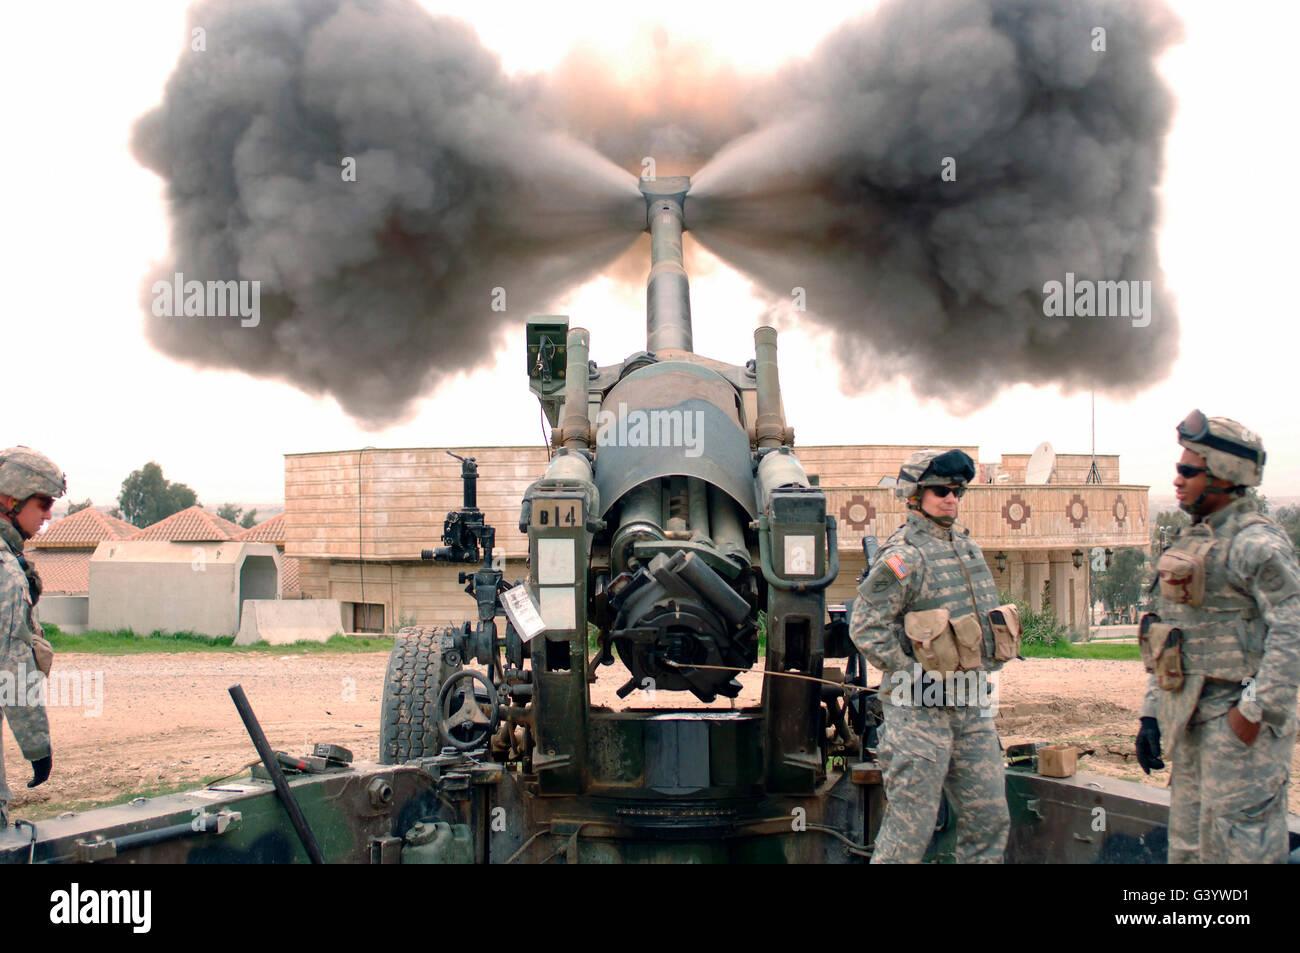 ВM198 155mm Towed Howitzer 5X7 PHOTOGRAPH US Marine Corps USMC